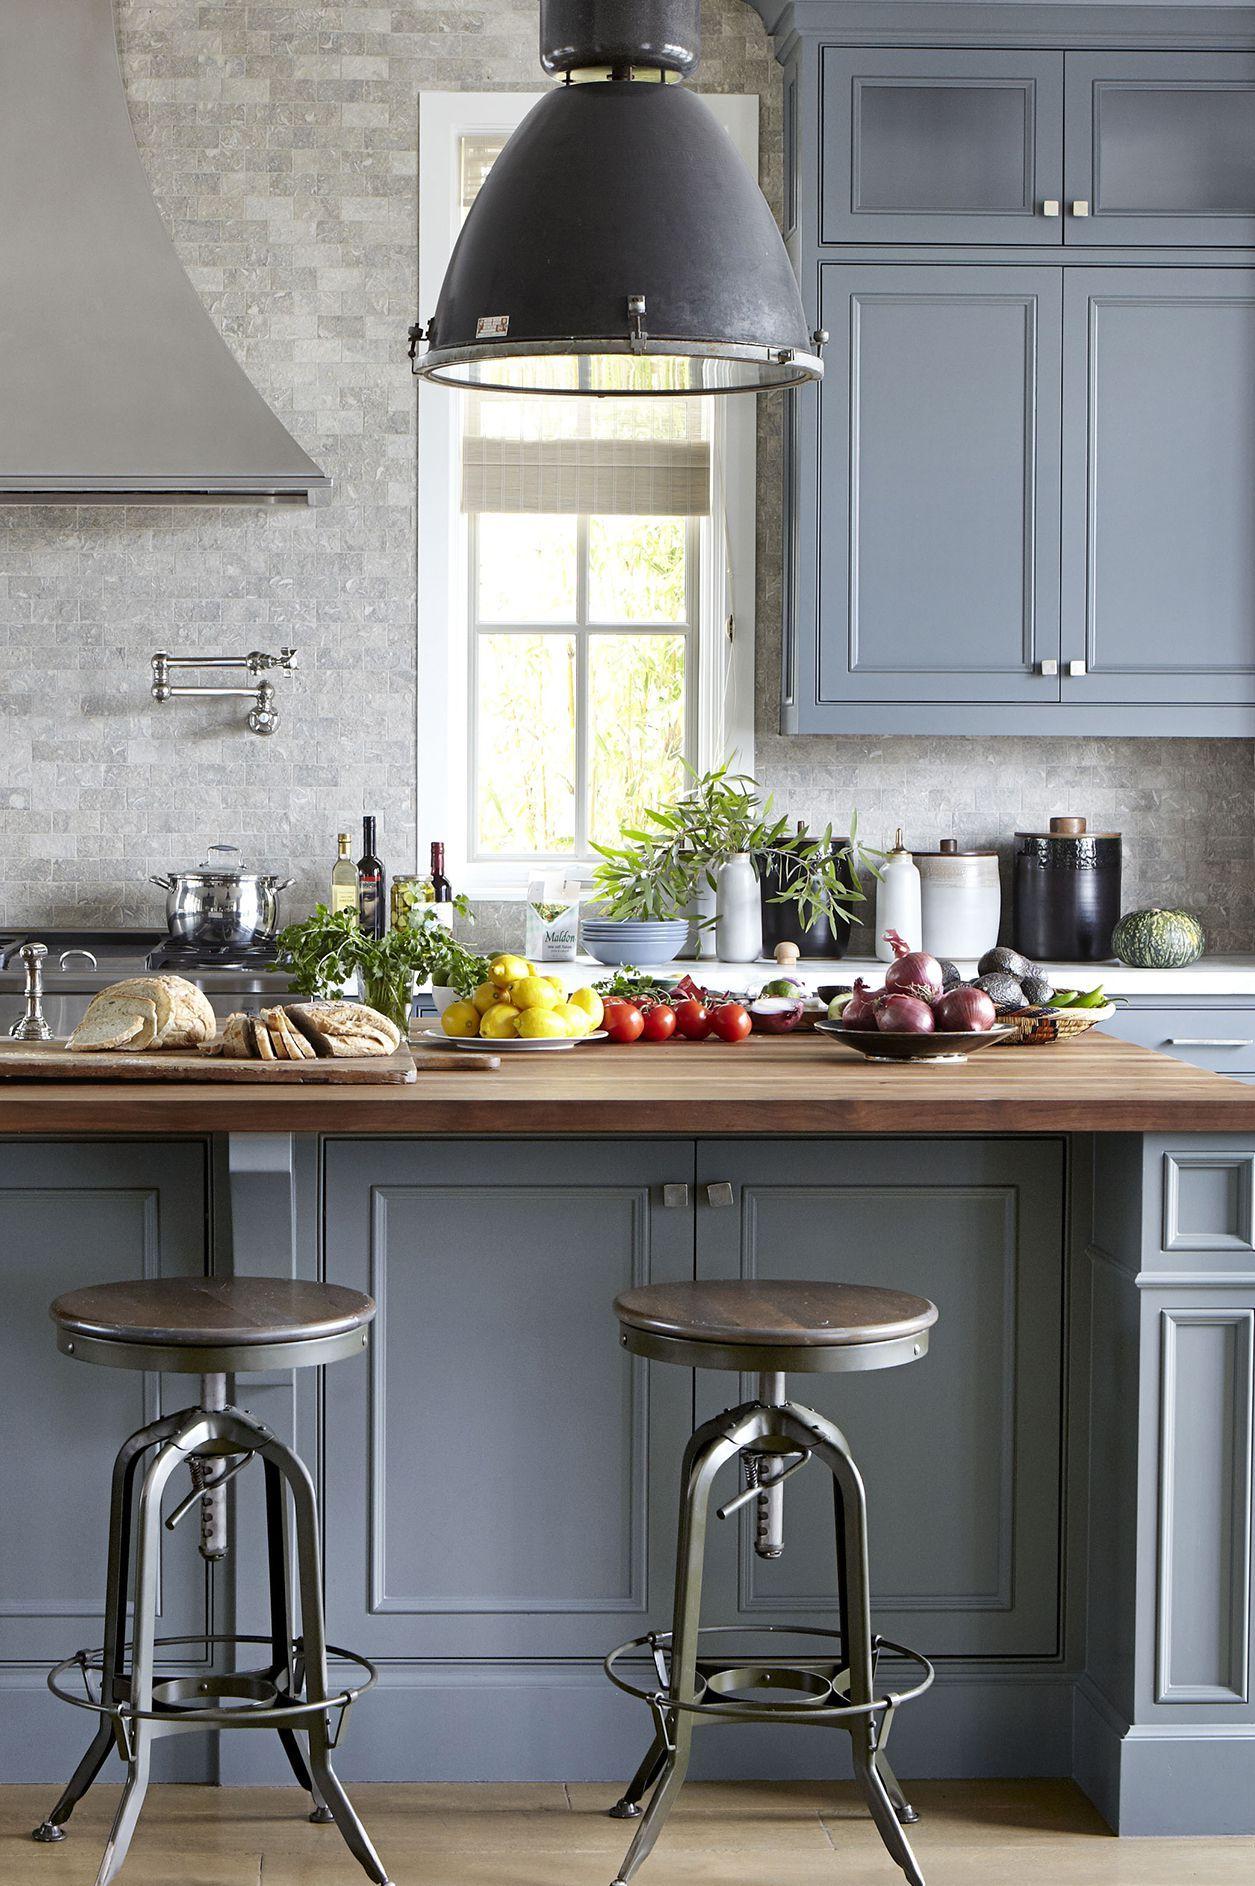 Hands Down These Are The Best 43 Colors To Use In Your Kitchen Mutfak Ic Dekorasyonu Mutfak Yenileme Mutfak Tasarimlari